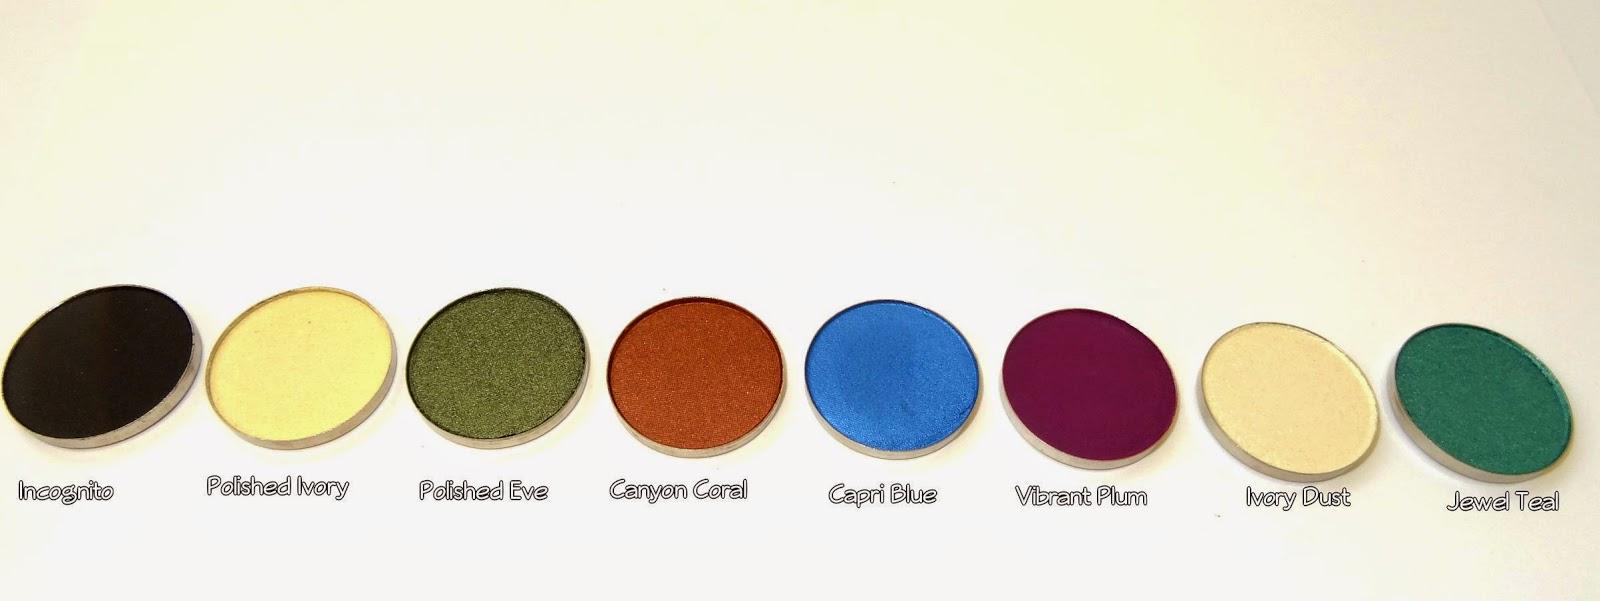 coastal scents hot pots haul Incognito,polished ivory, polished eve,canyon coral, Capri blue,vibrant plum, ivory dust,jewel teal